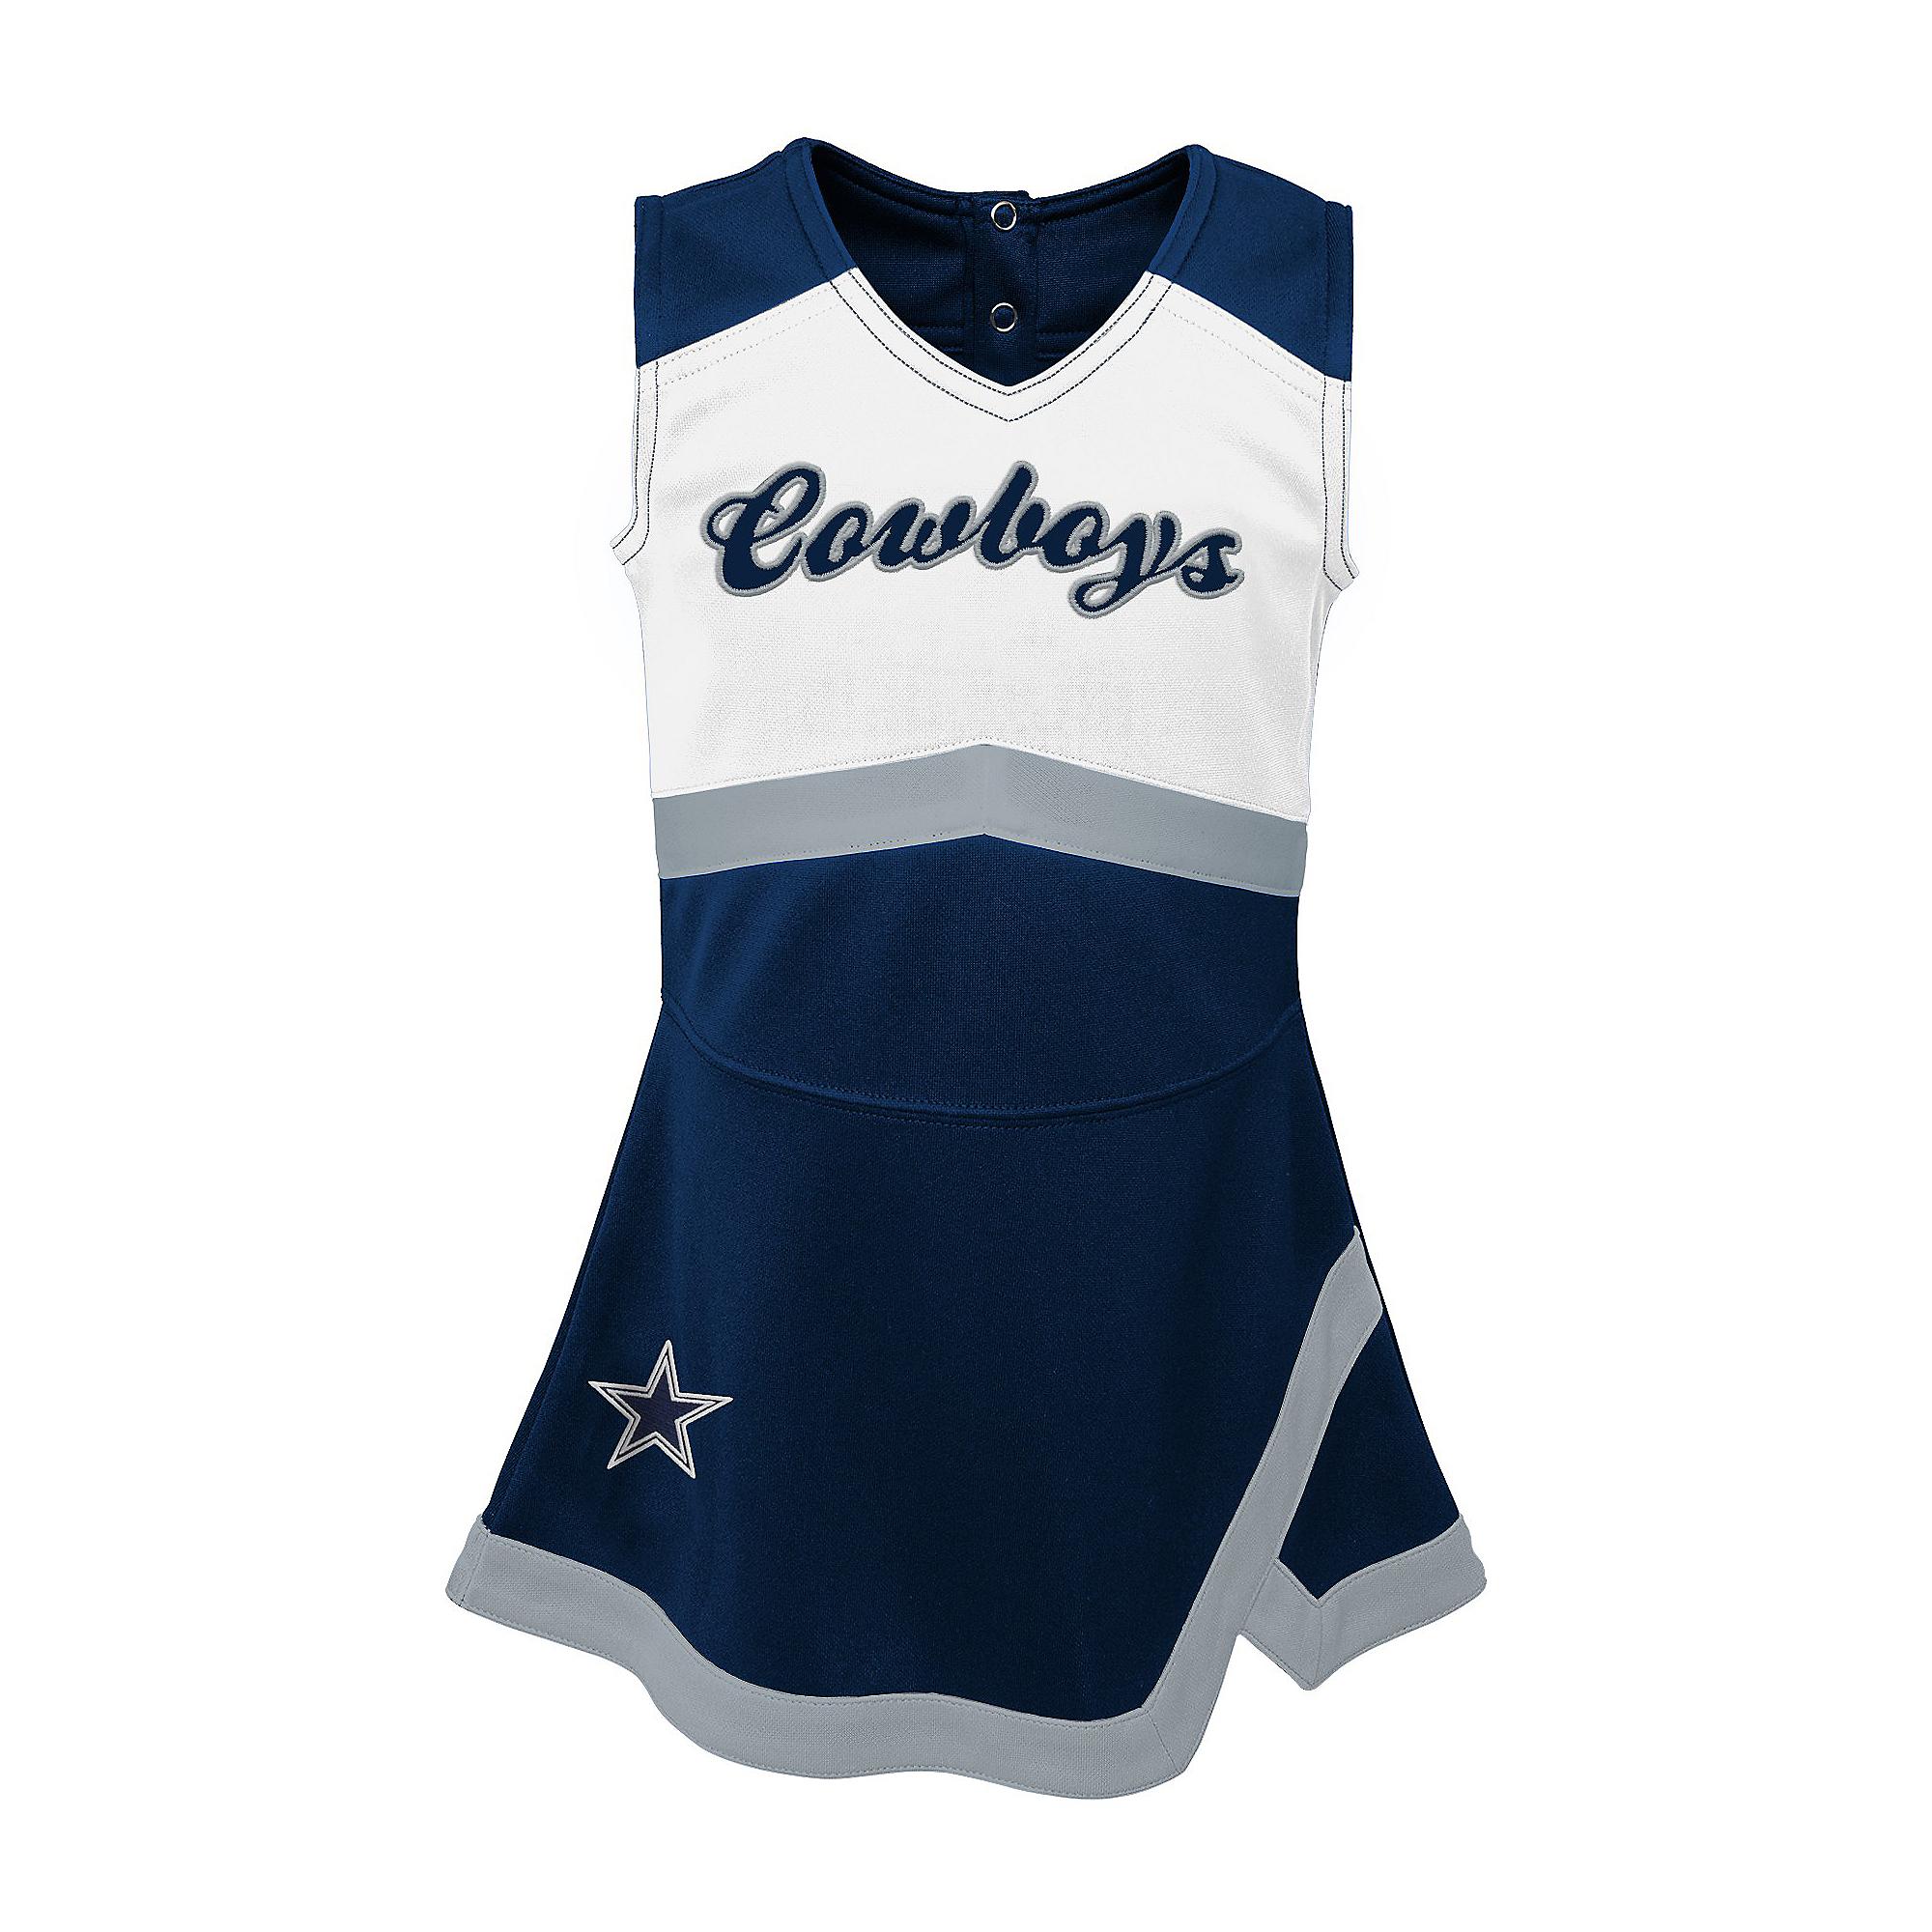 Dallas Cowboys Cheerleader Toddler Cheer Captain Jumper Dress